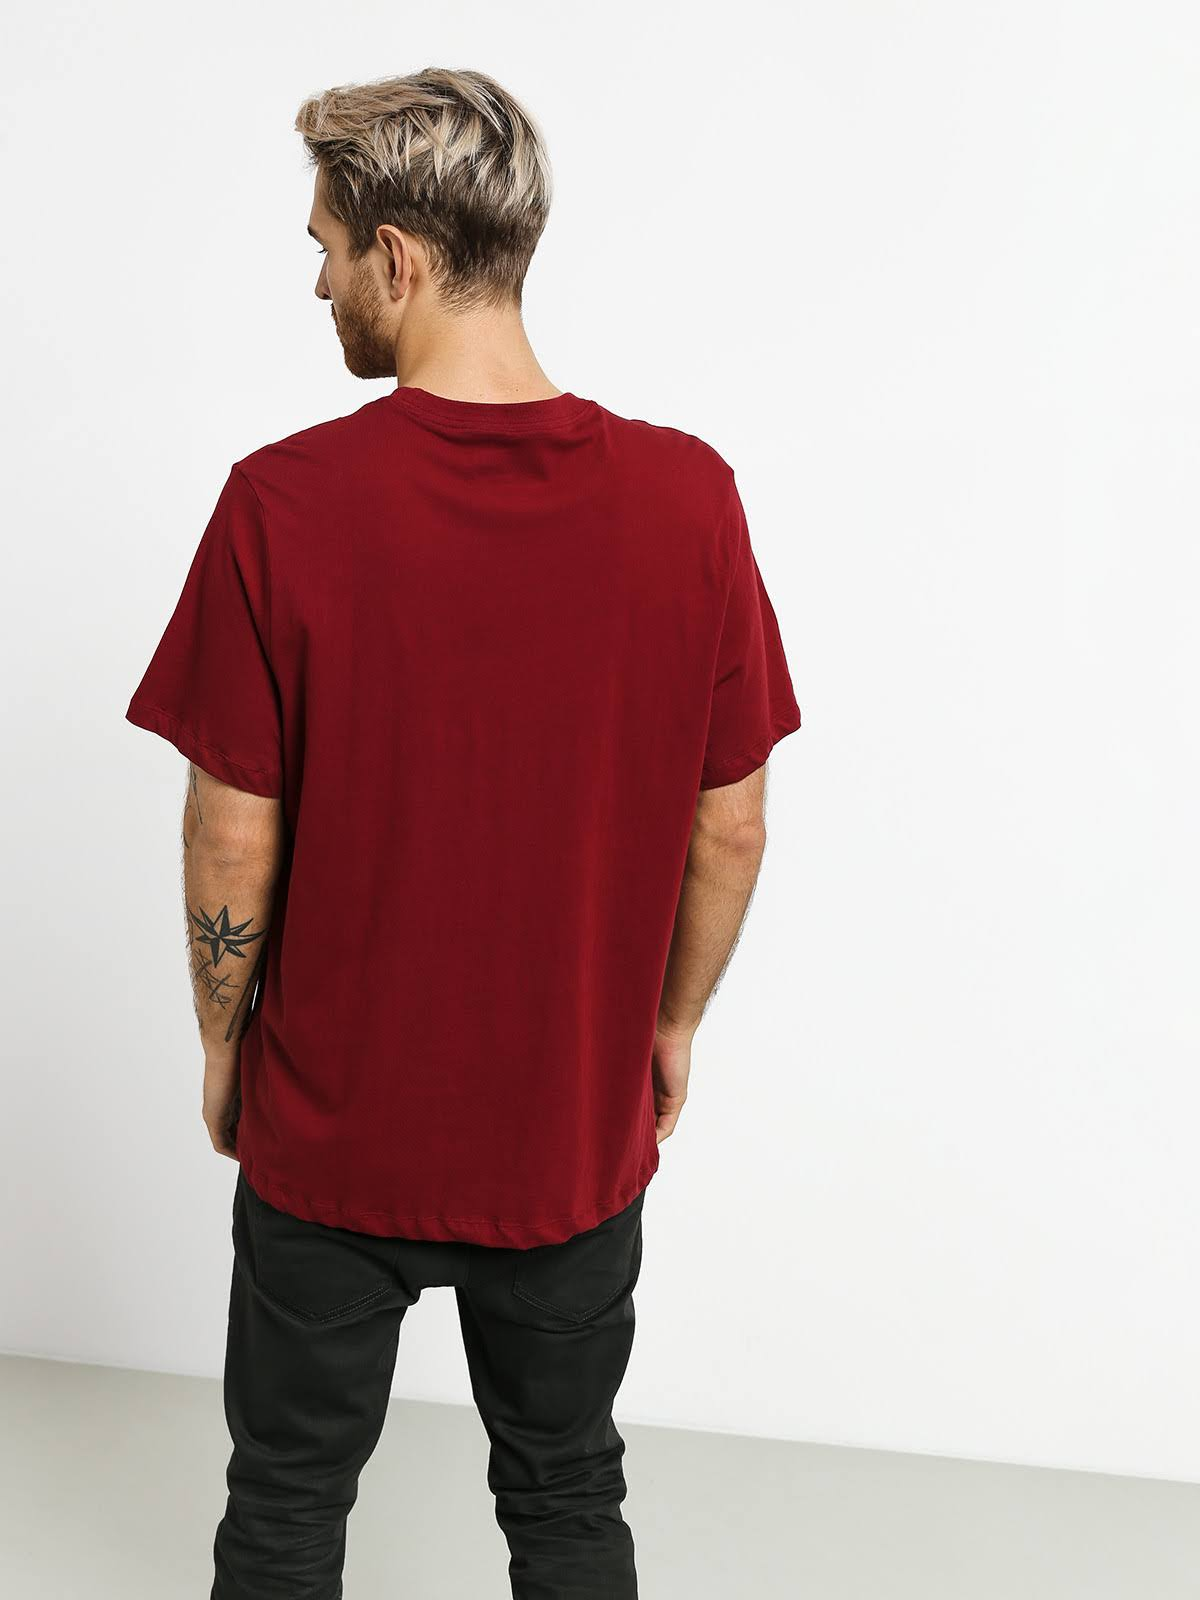 Nike SB Concrete Logo T-Shirt - S - Team Red